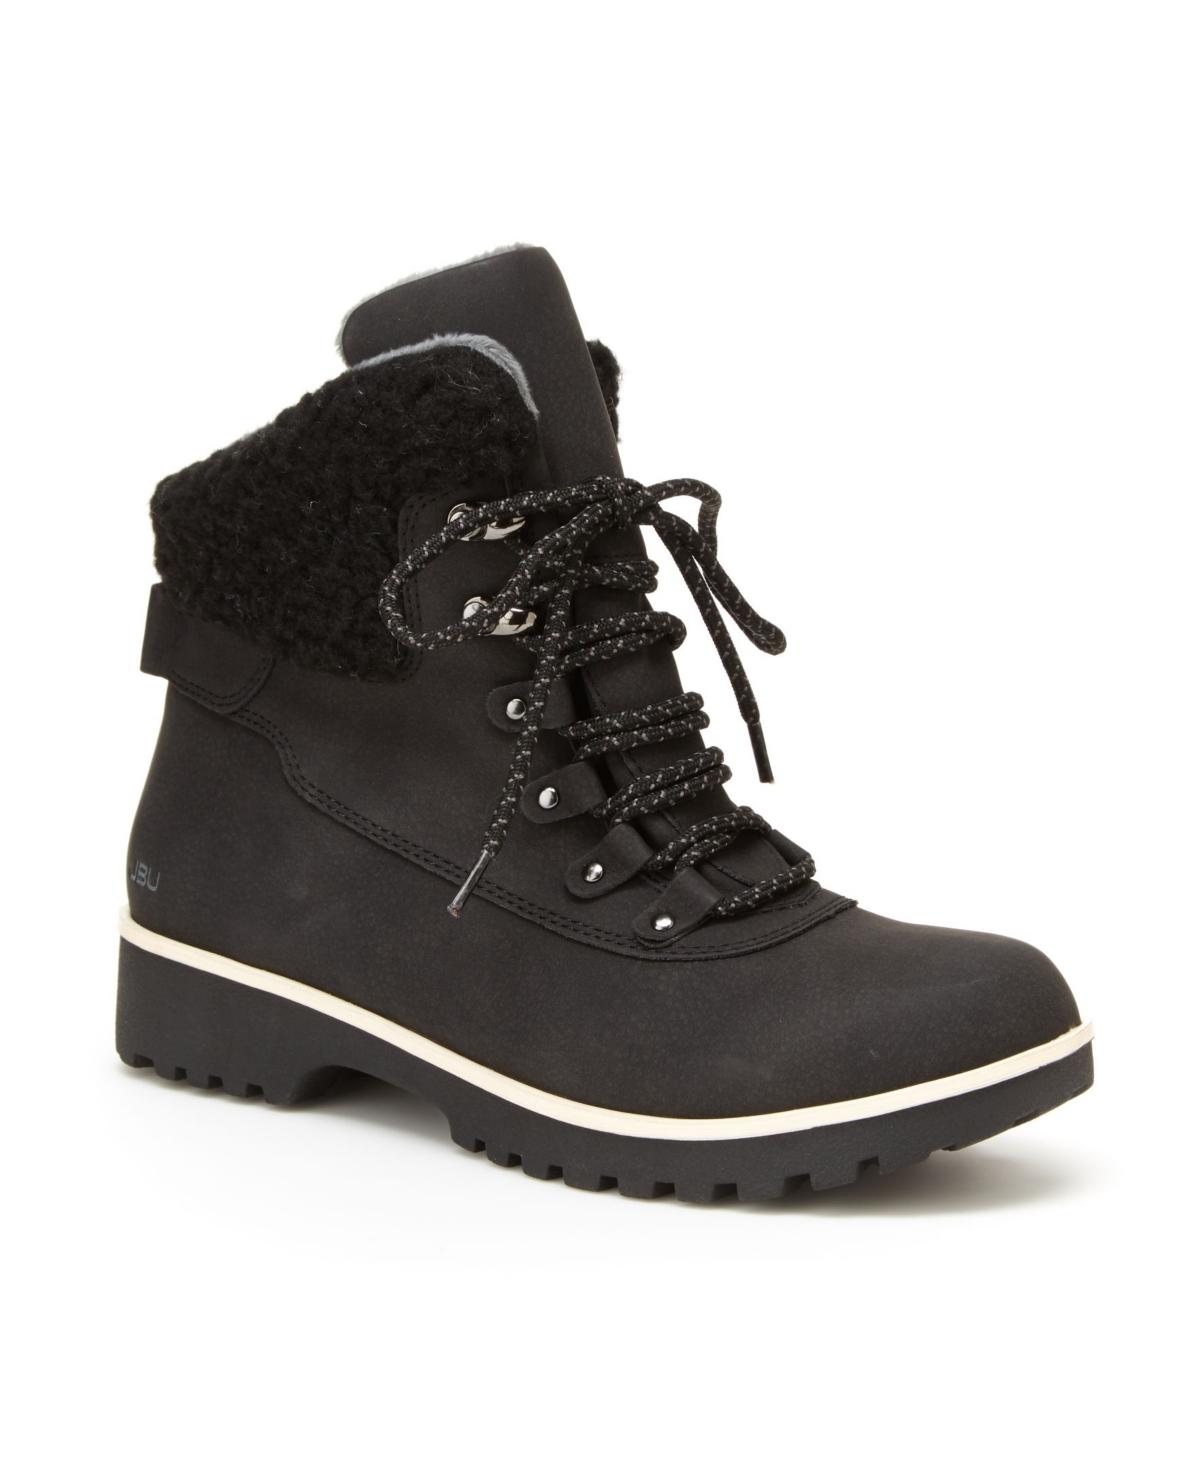 Redrock Women's Ankle Boots Women's Shoes